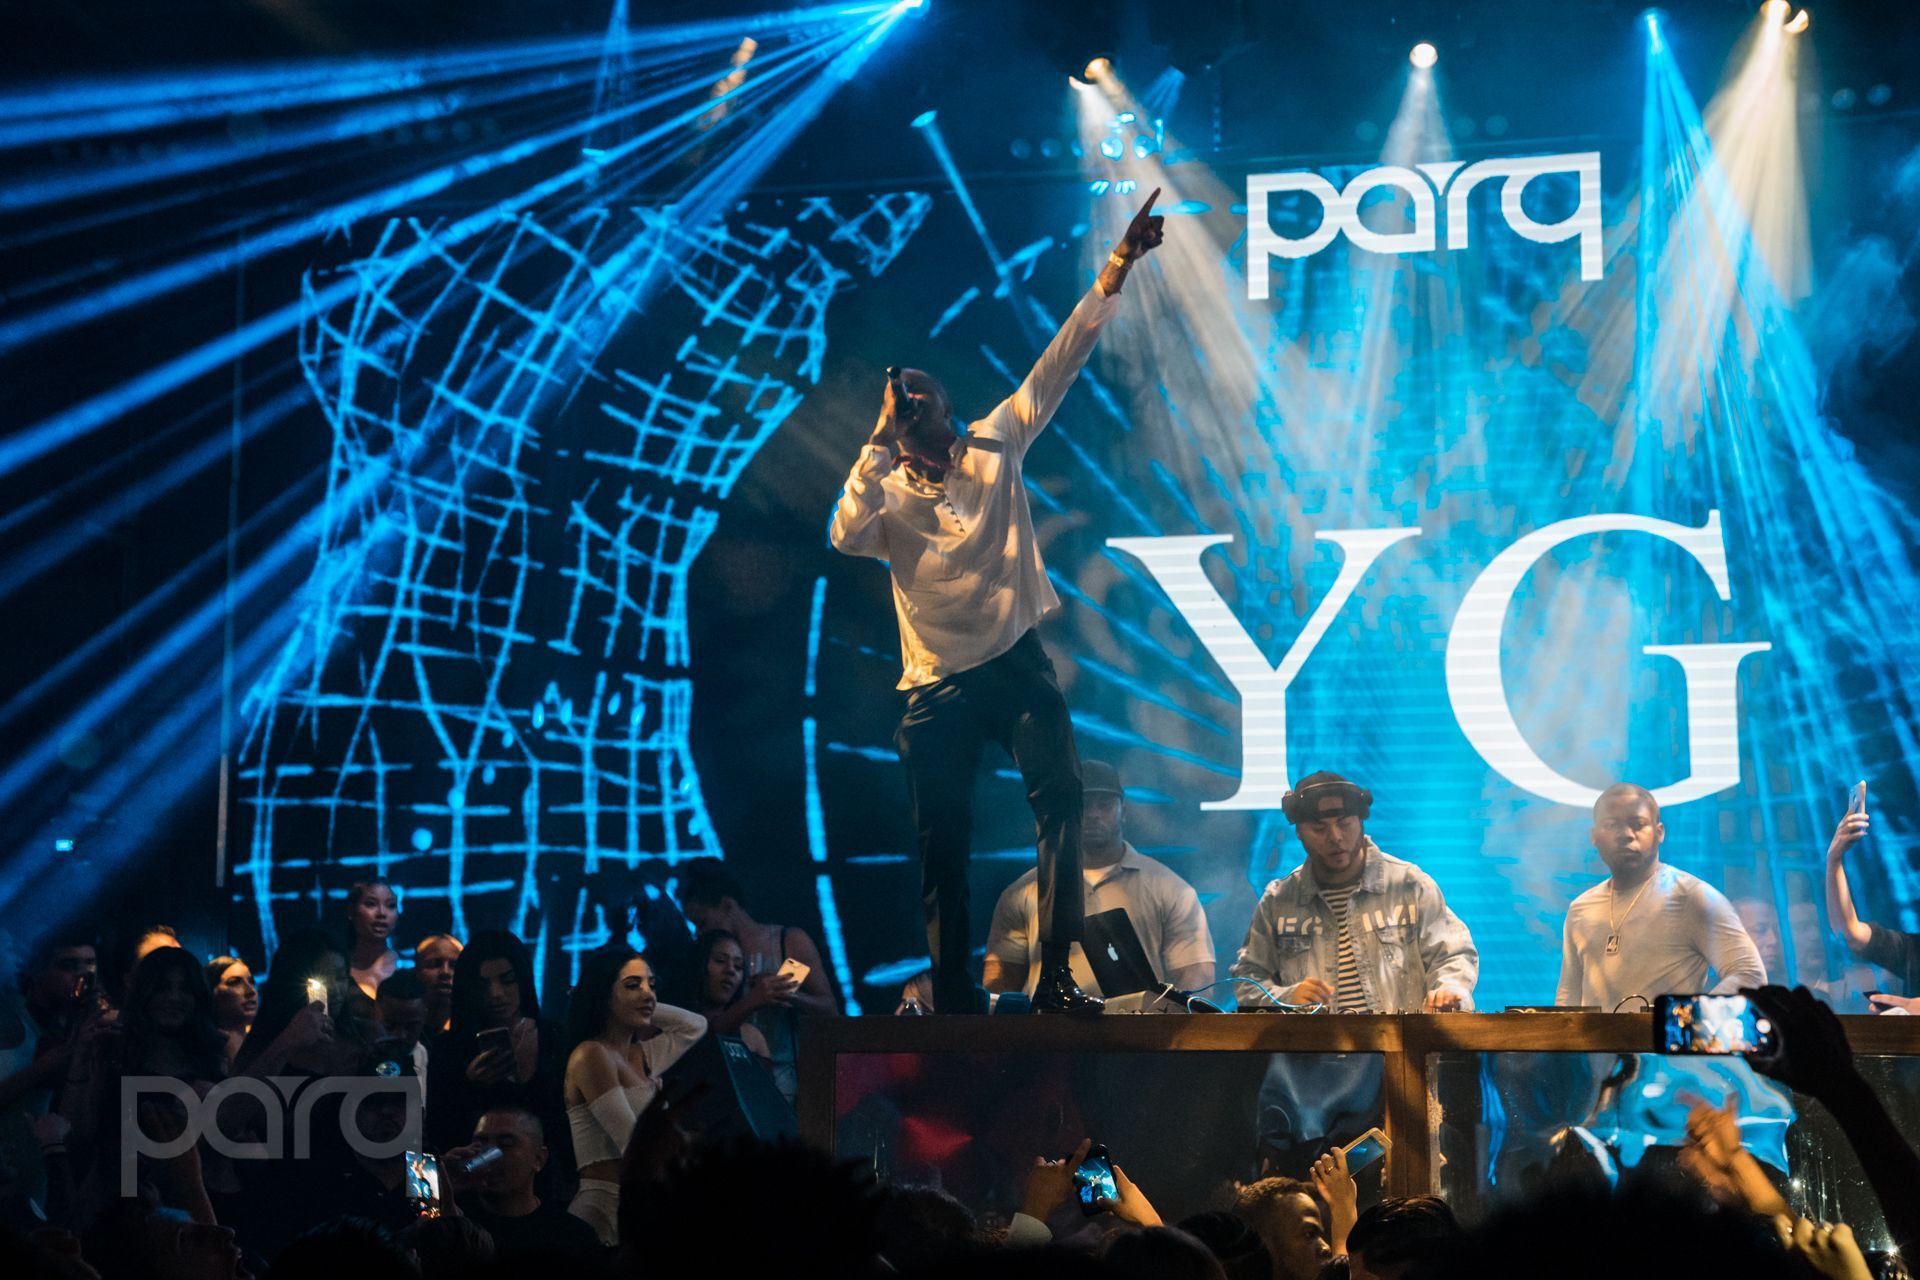 11.22.17 Parq - YG-12.jpg